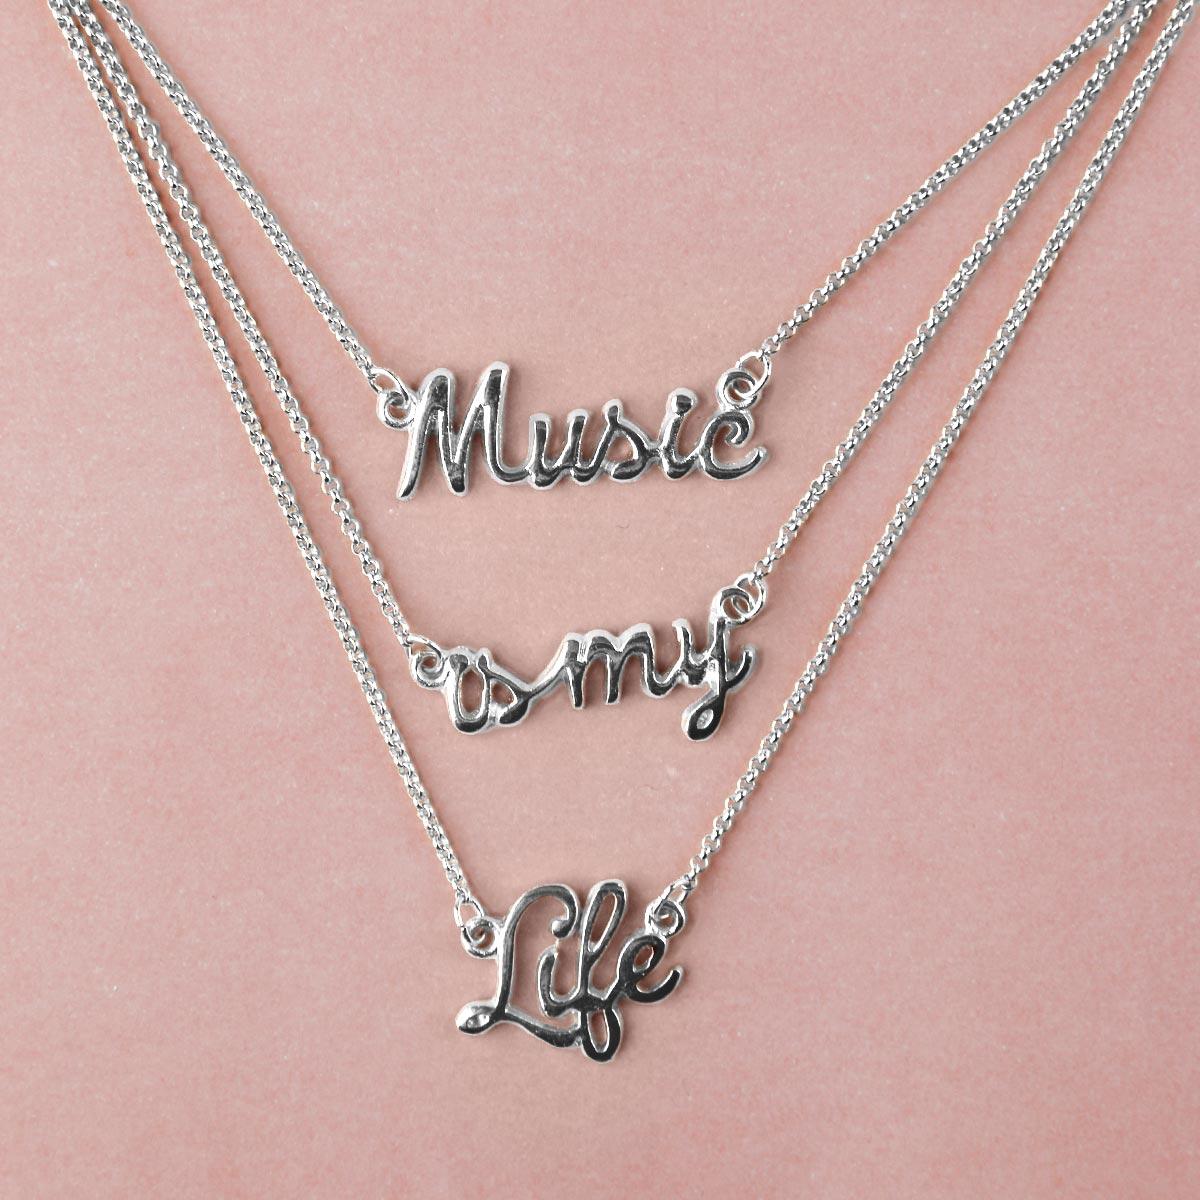 Colar Prata Luan Santana Music Is My Life